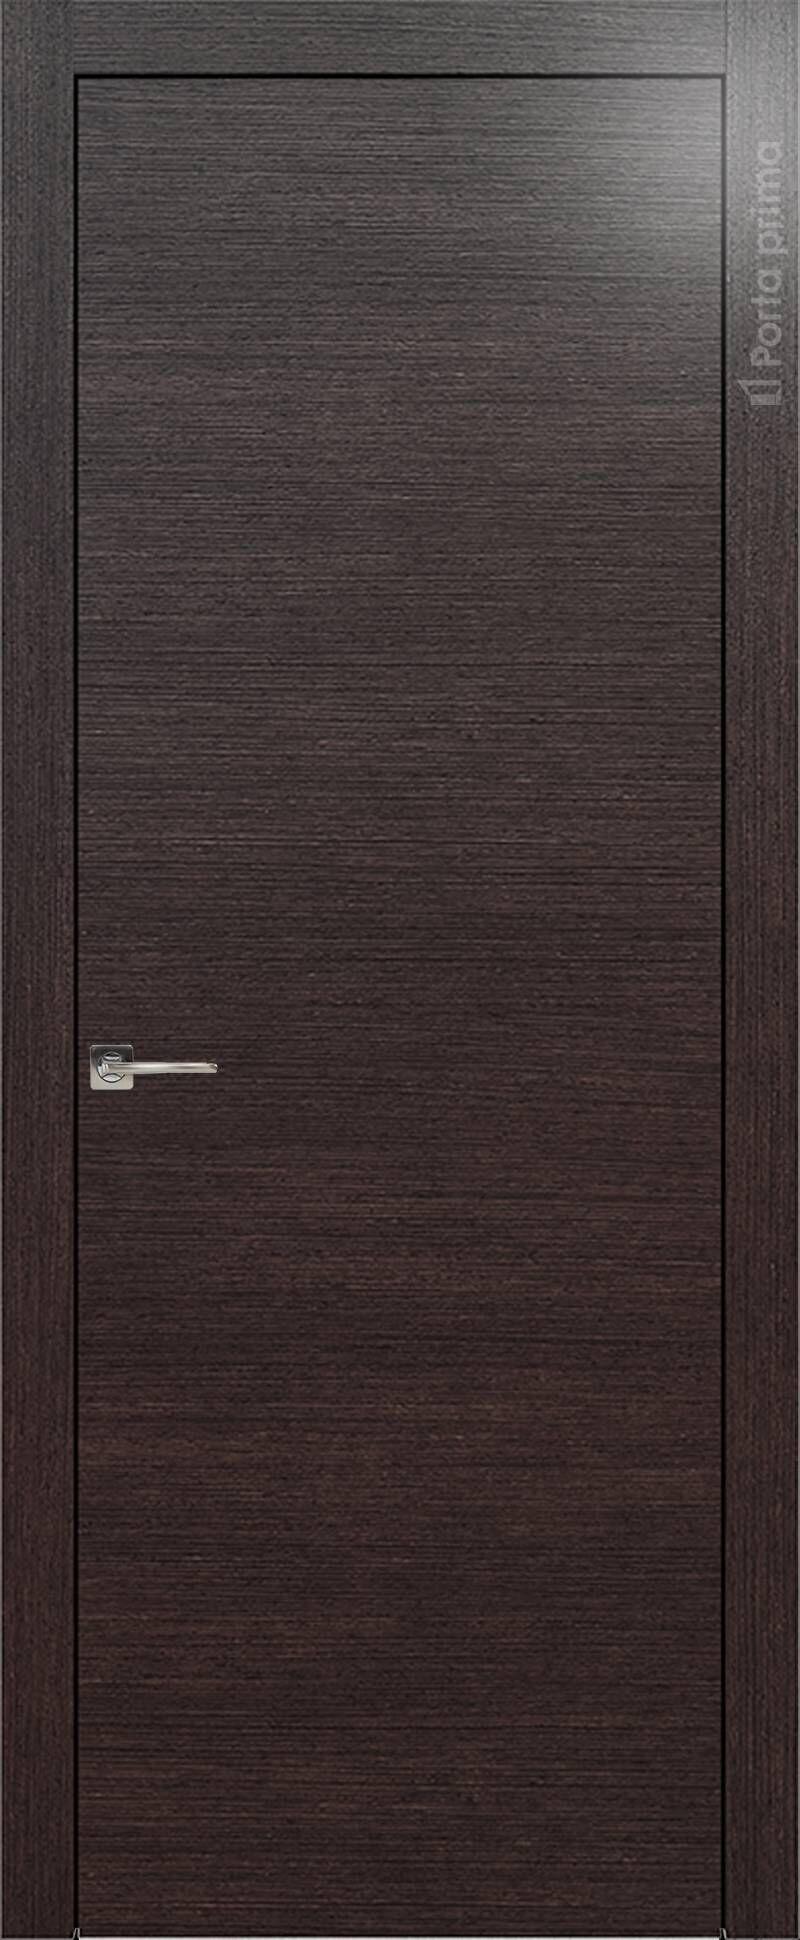 Tivoli А-2 цвет - Венге Шоколад Без стекла (ДГ)